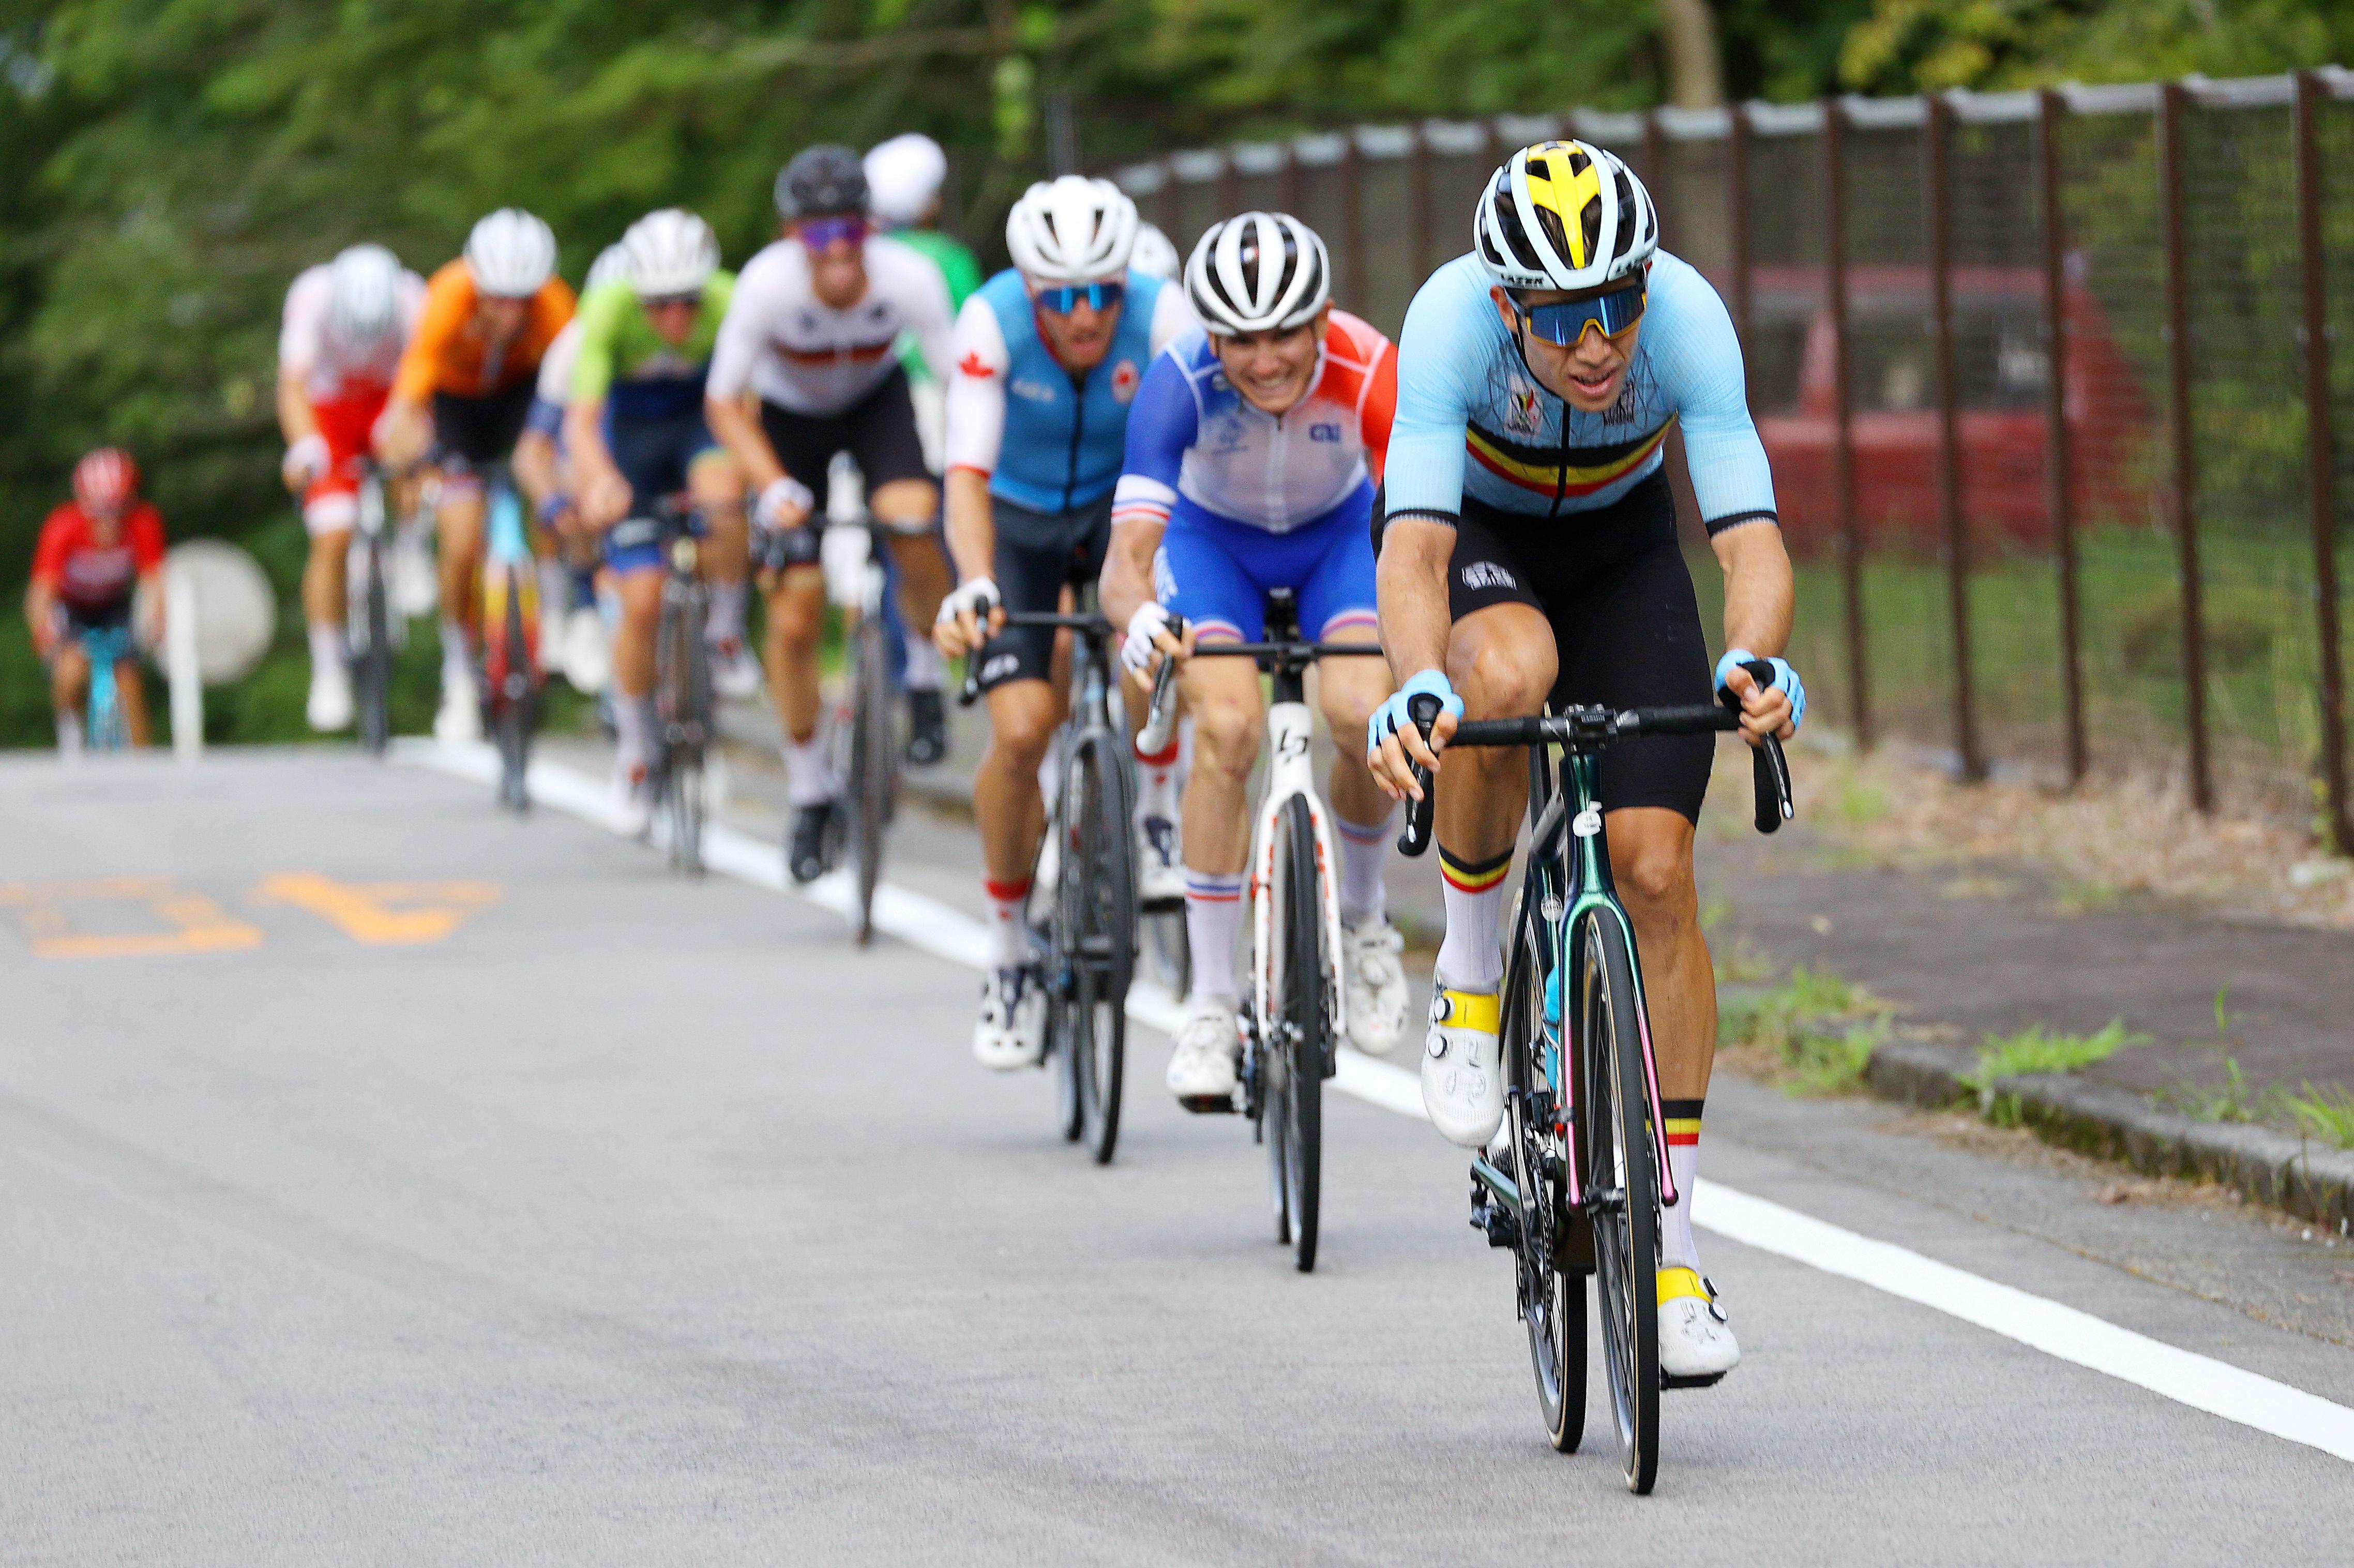 Tokyo 2020 Olympics - Cycling - Road - Men's Road Race - Final - Tokyo to Fuji International Speedway, Japan - July 24, 2021. Wout van Aert of Belgium in action during the Men's Road Race.  Pool via Reuters/Tim de Waele